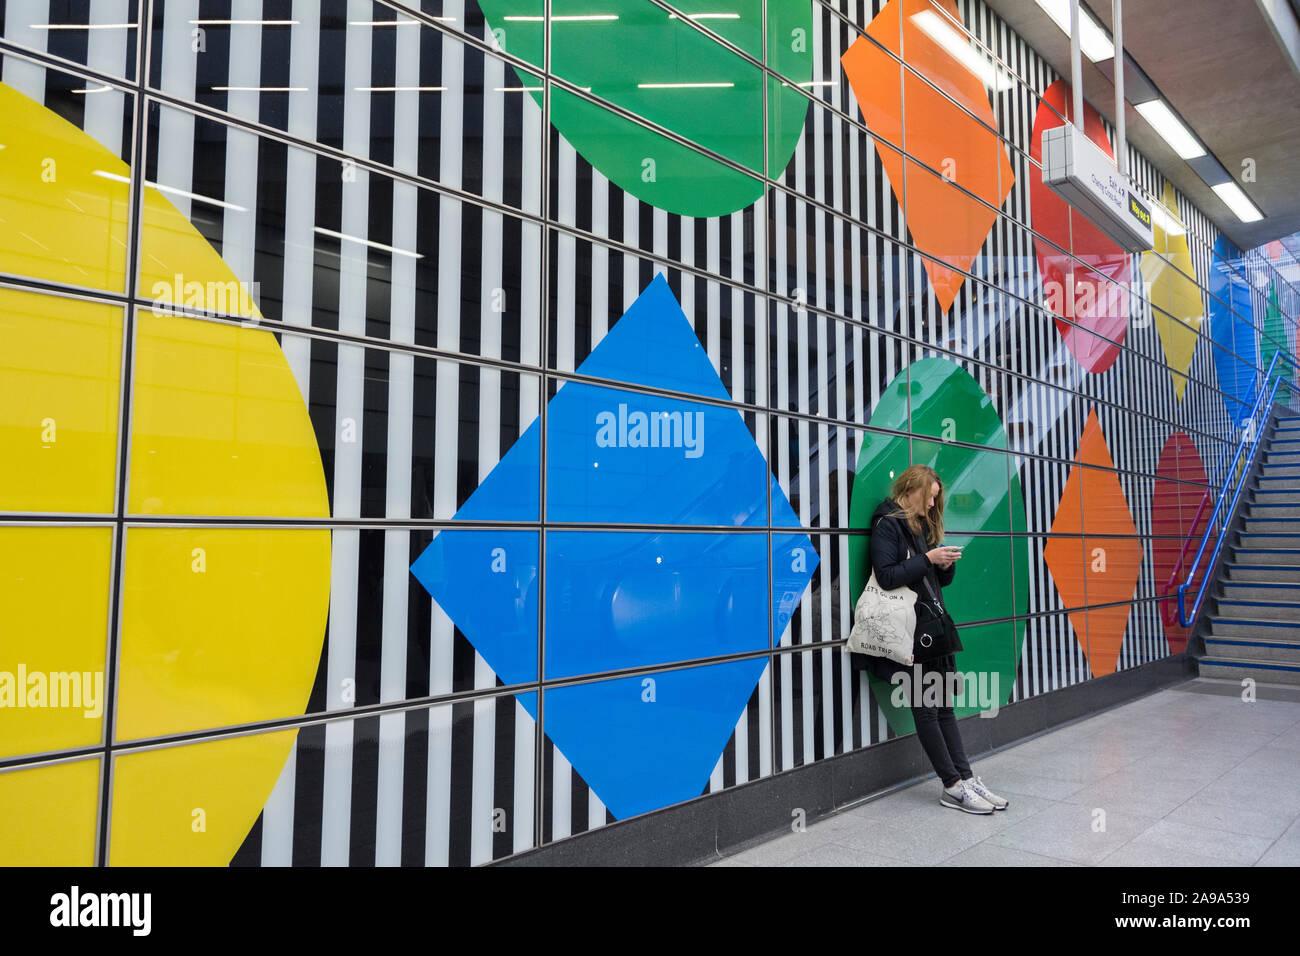 Daniel Buren S Wide Stripes And Geometric Patterns At Tottenham Court Road Underground Station London Uk Stock Photo Alamy